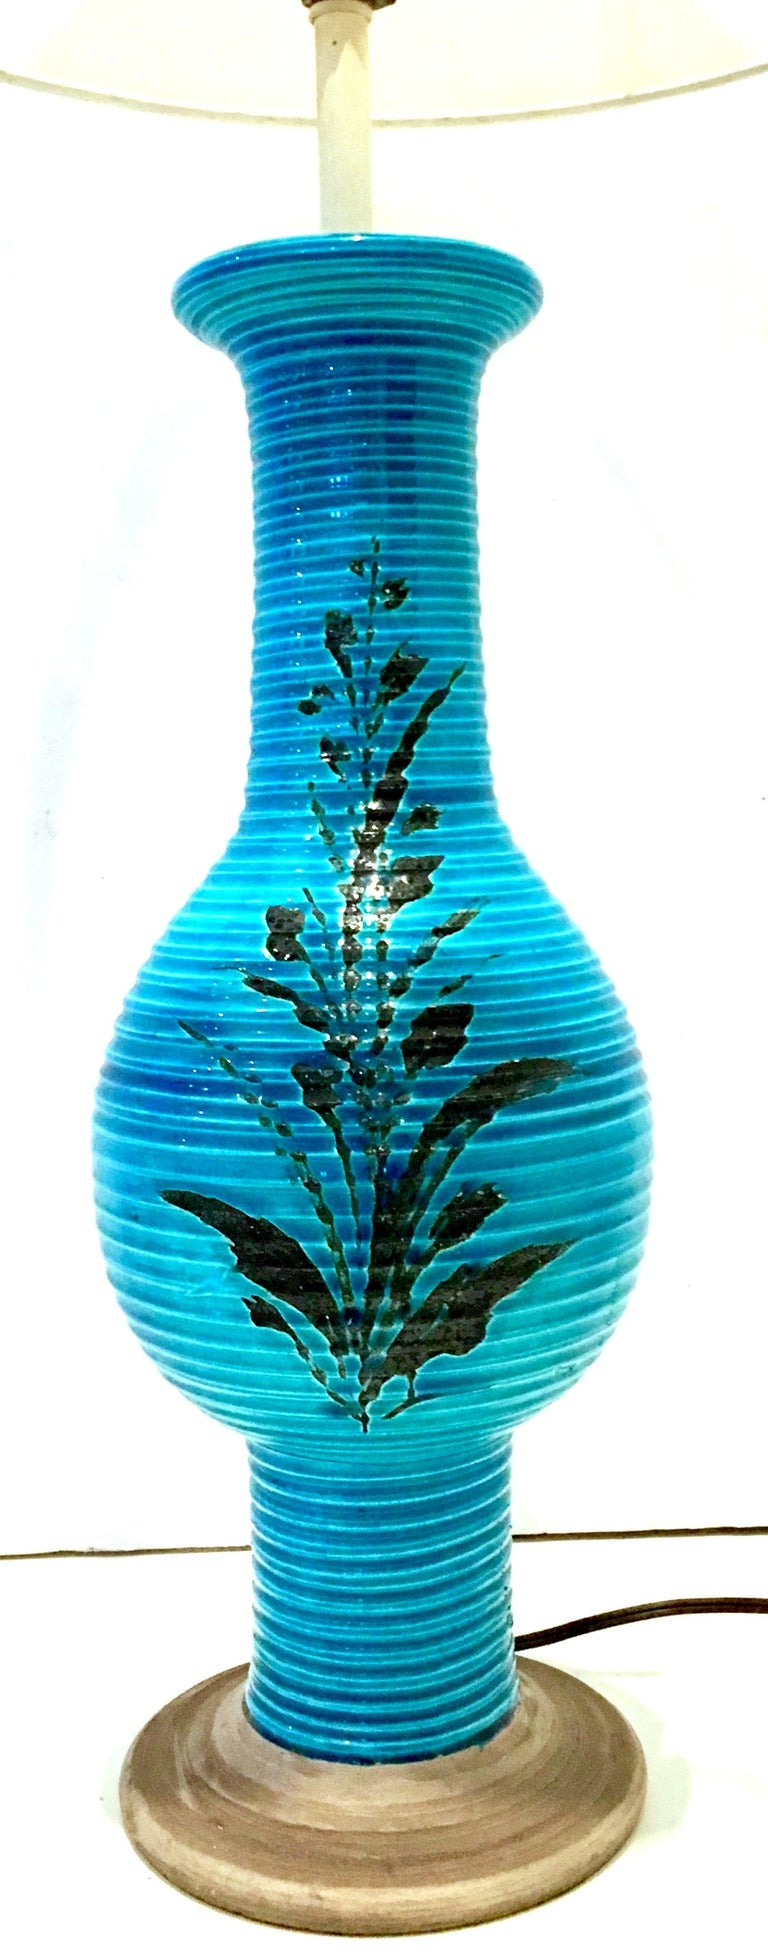 Mid-Century Modern 1960s Italian Cerulean Blue & Black Ceramic Glaze Pottery Lamp by, Bitossi For Sale